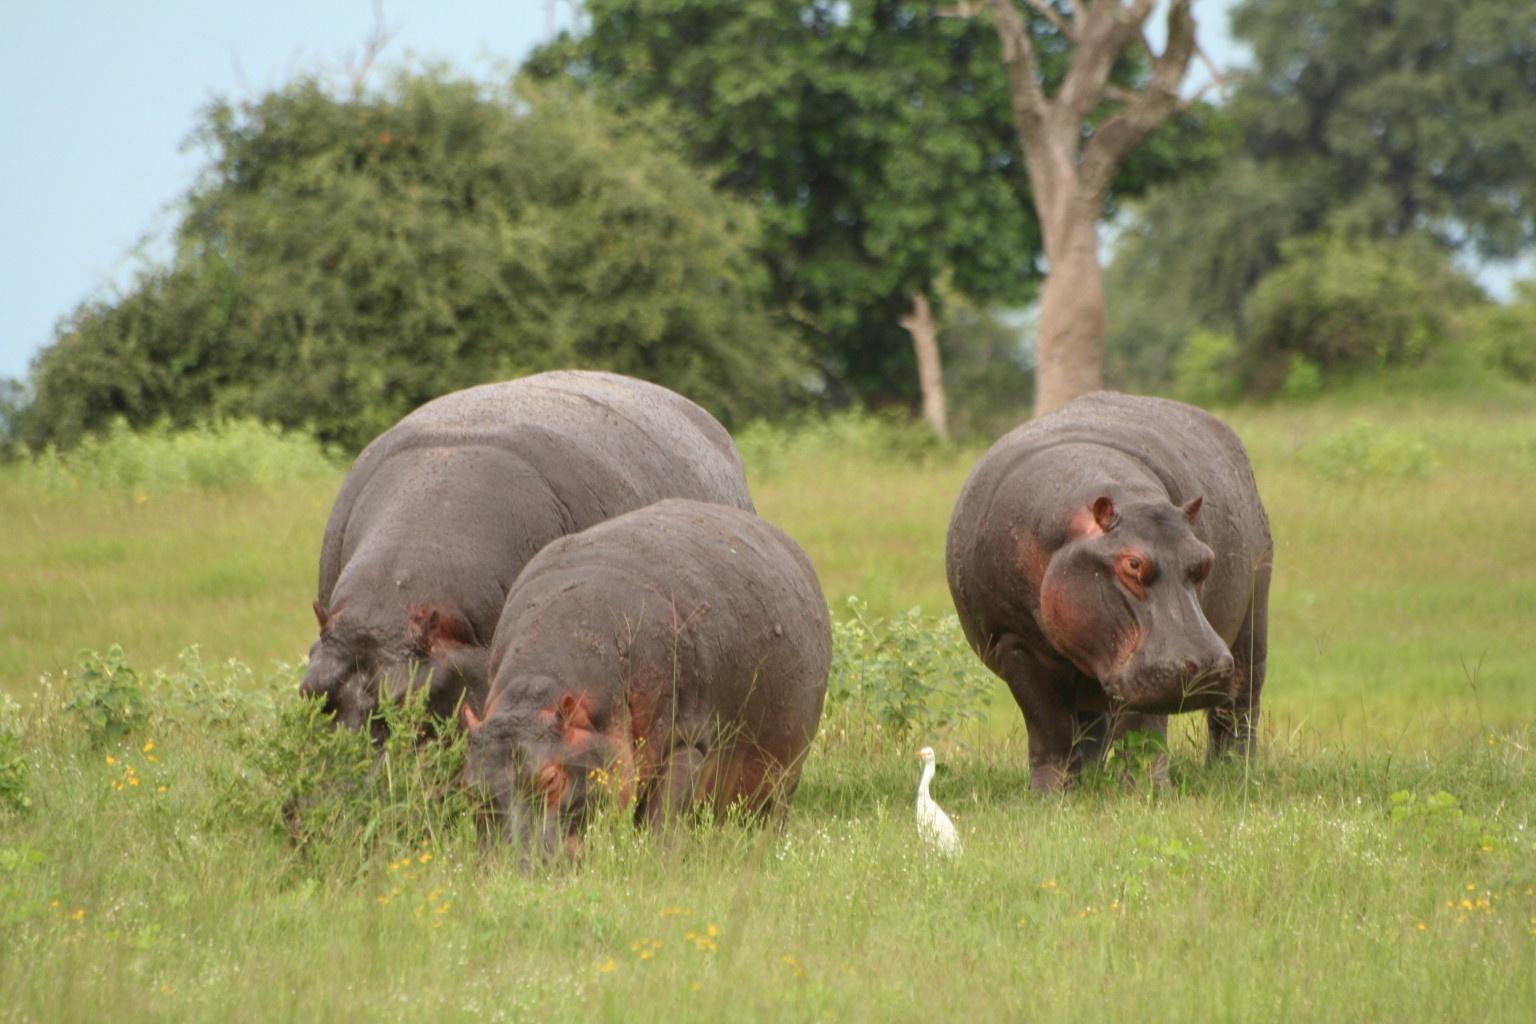 Hippo - the most dangerous wild animal